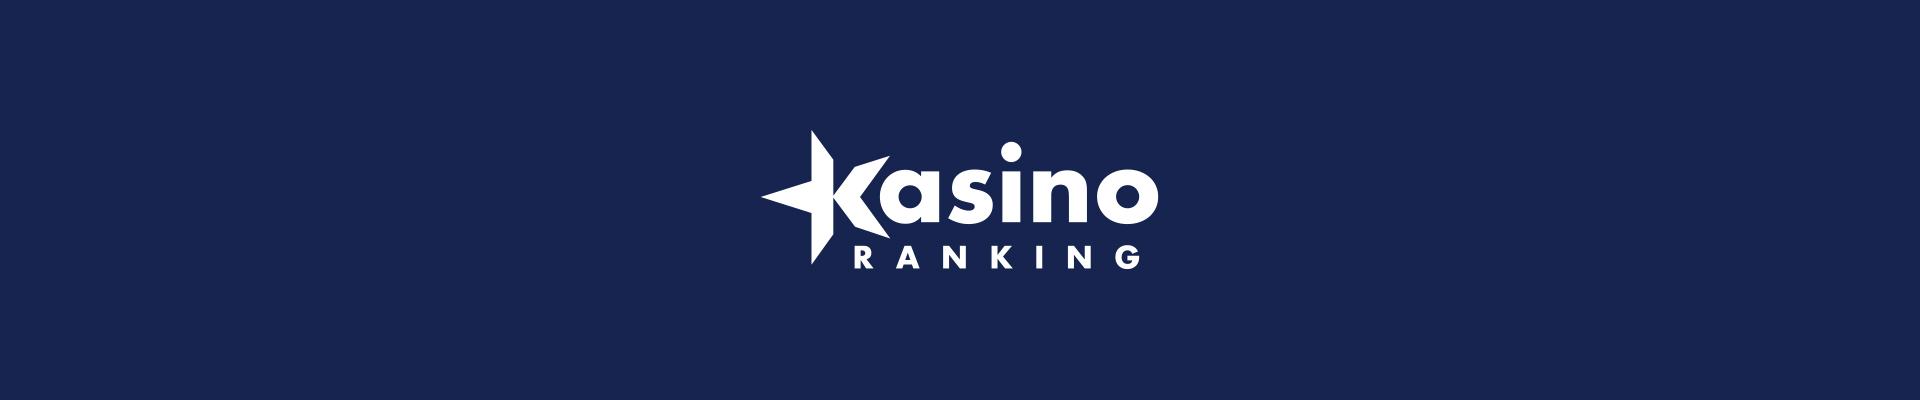 Kasinoranking.com